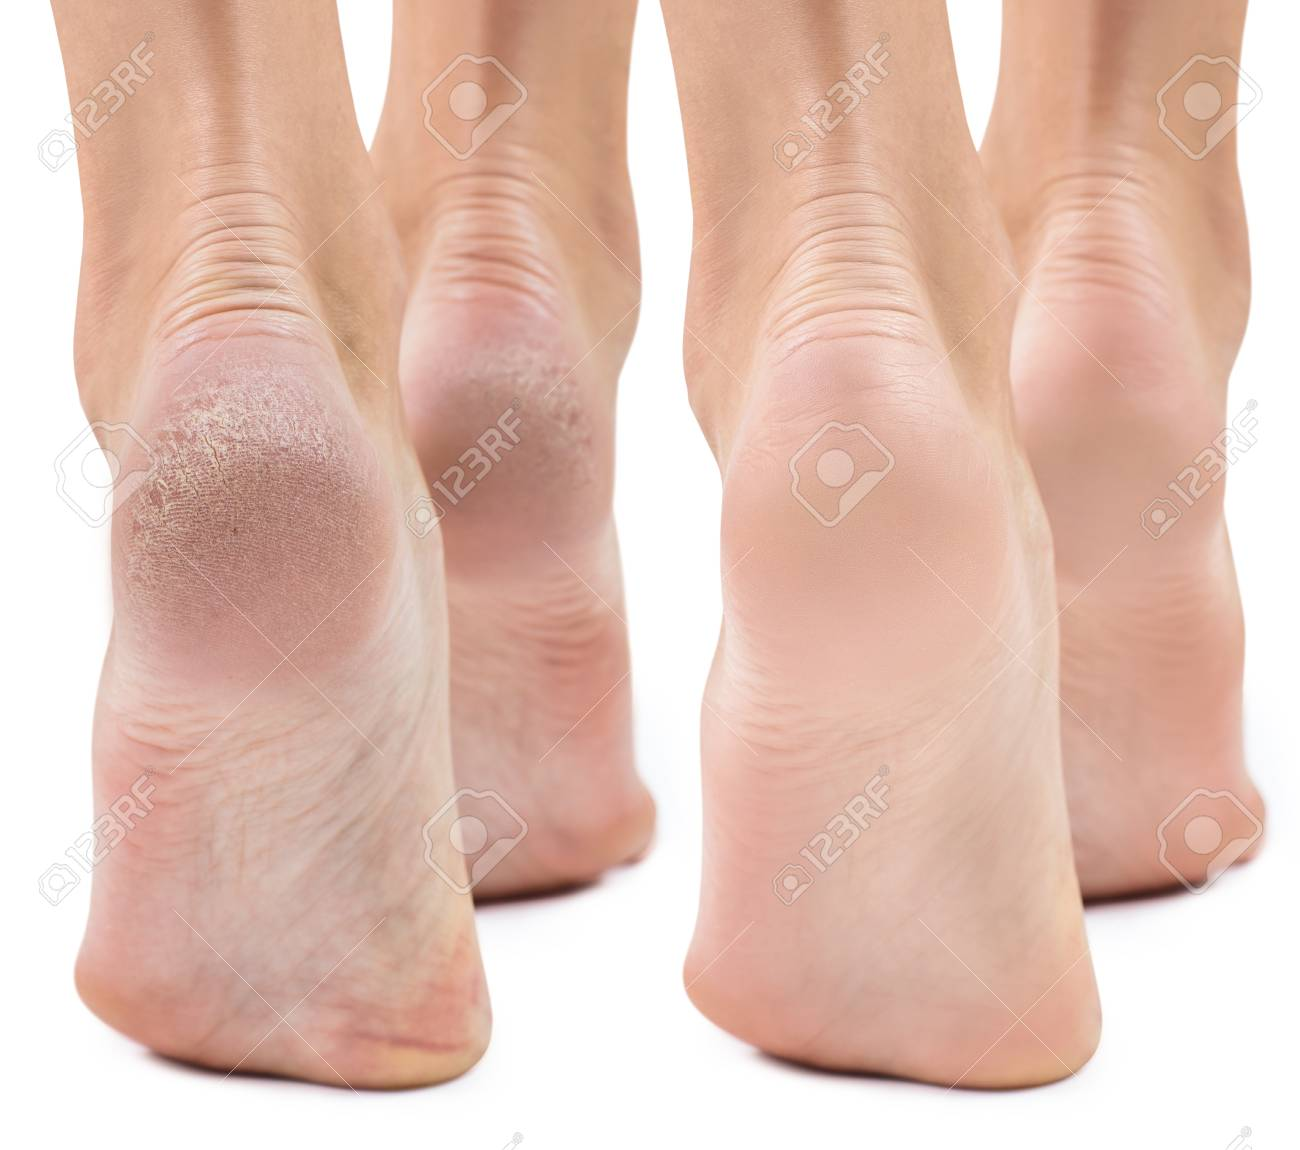 dry skin on feet treatment